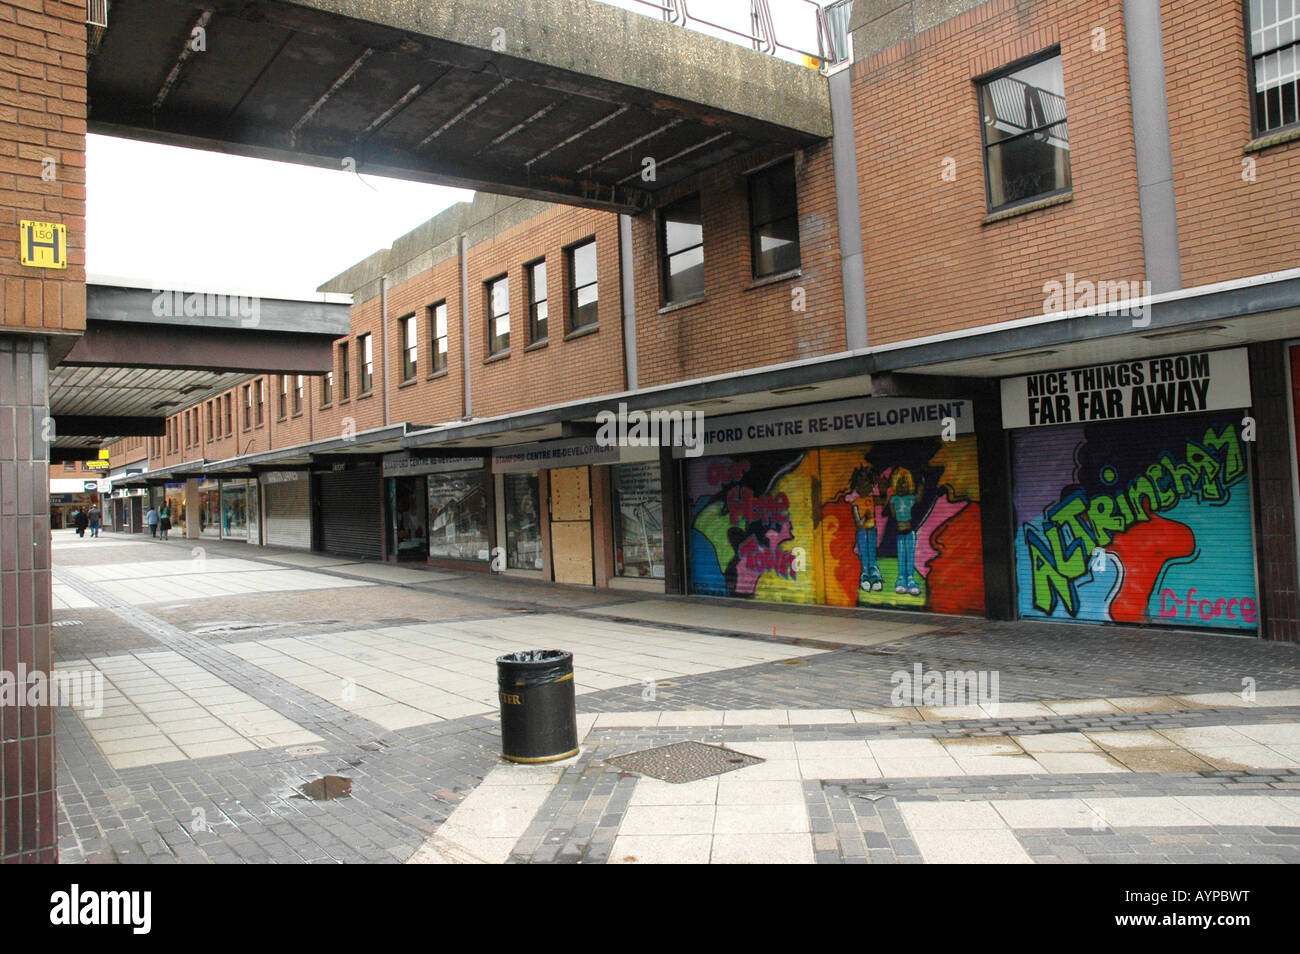 Closed shops in run down Altrincham - Stock Image